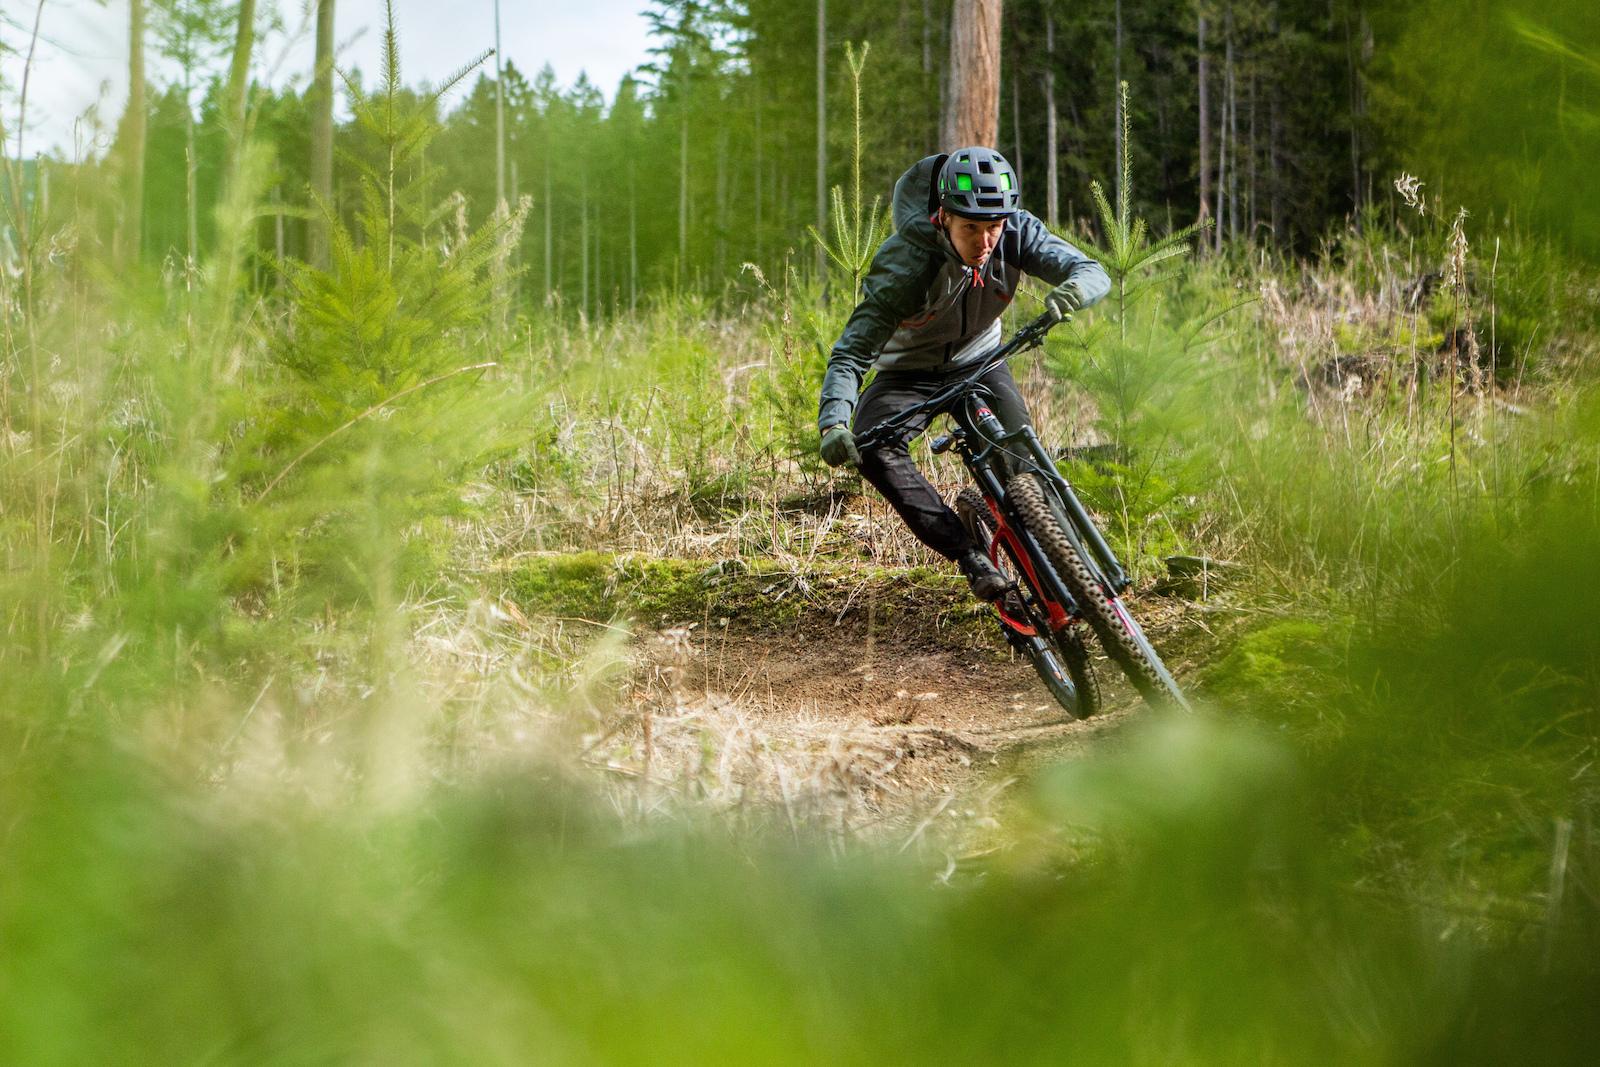 2021 Value Bikes Field Trip